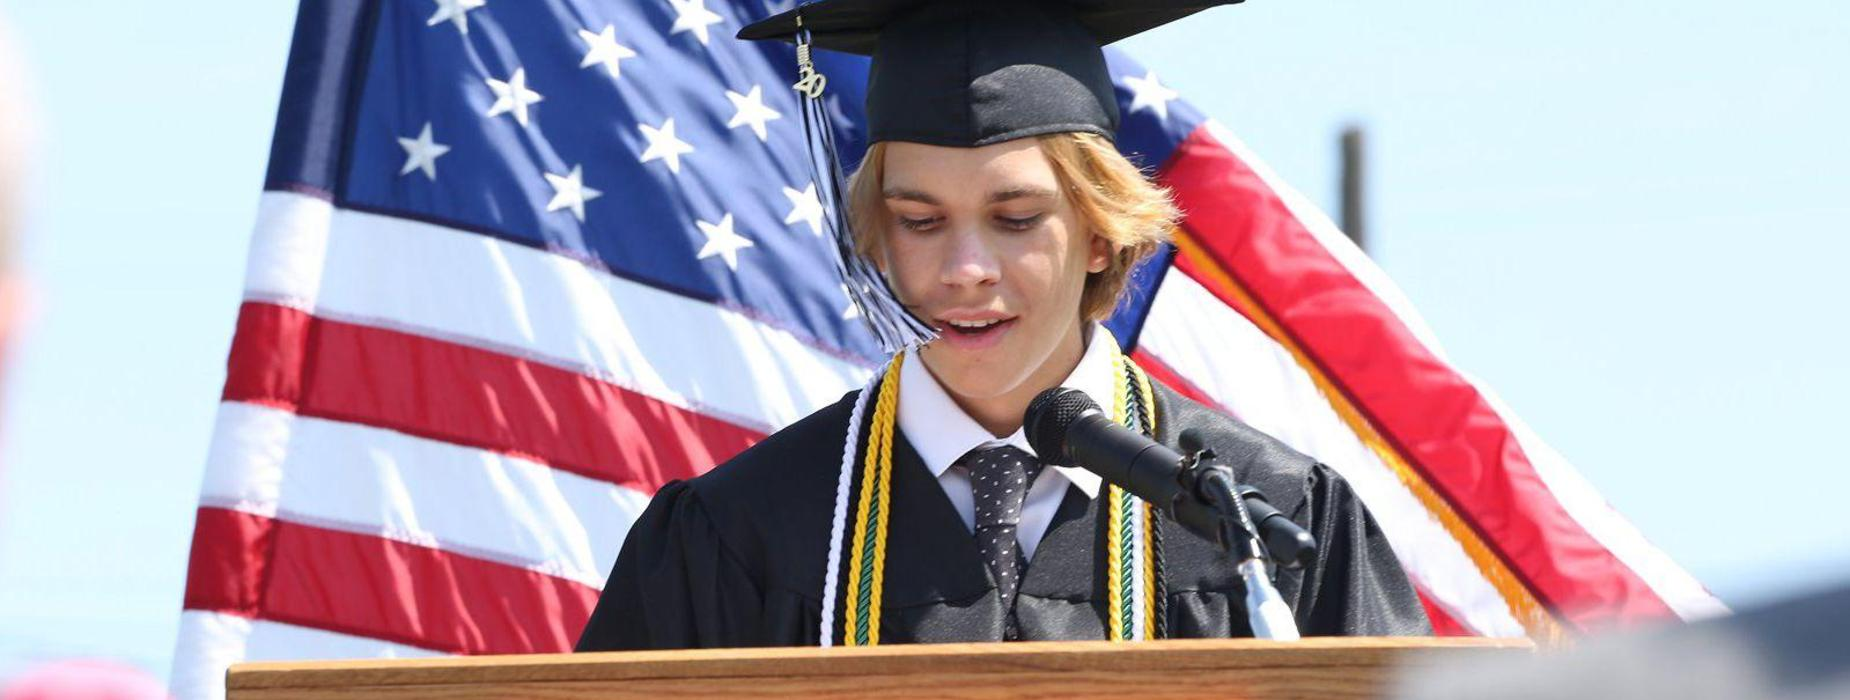 HC Graduation